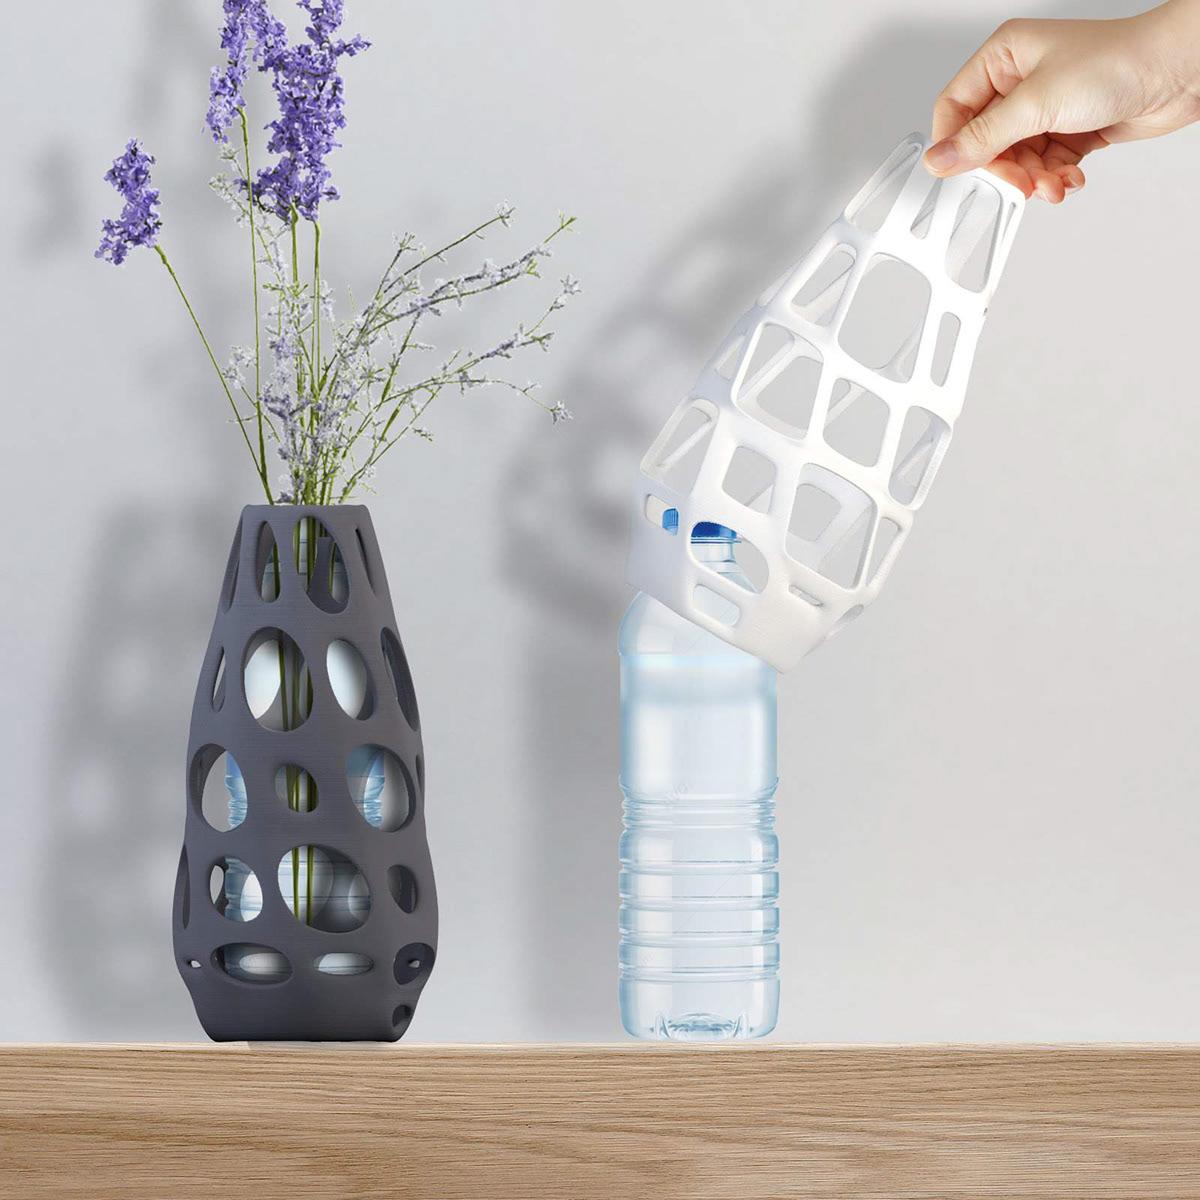 3dprinting bottle parametric recycling Vase